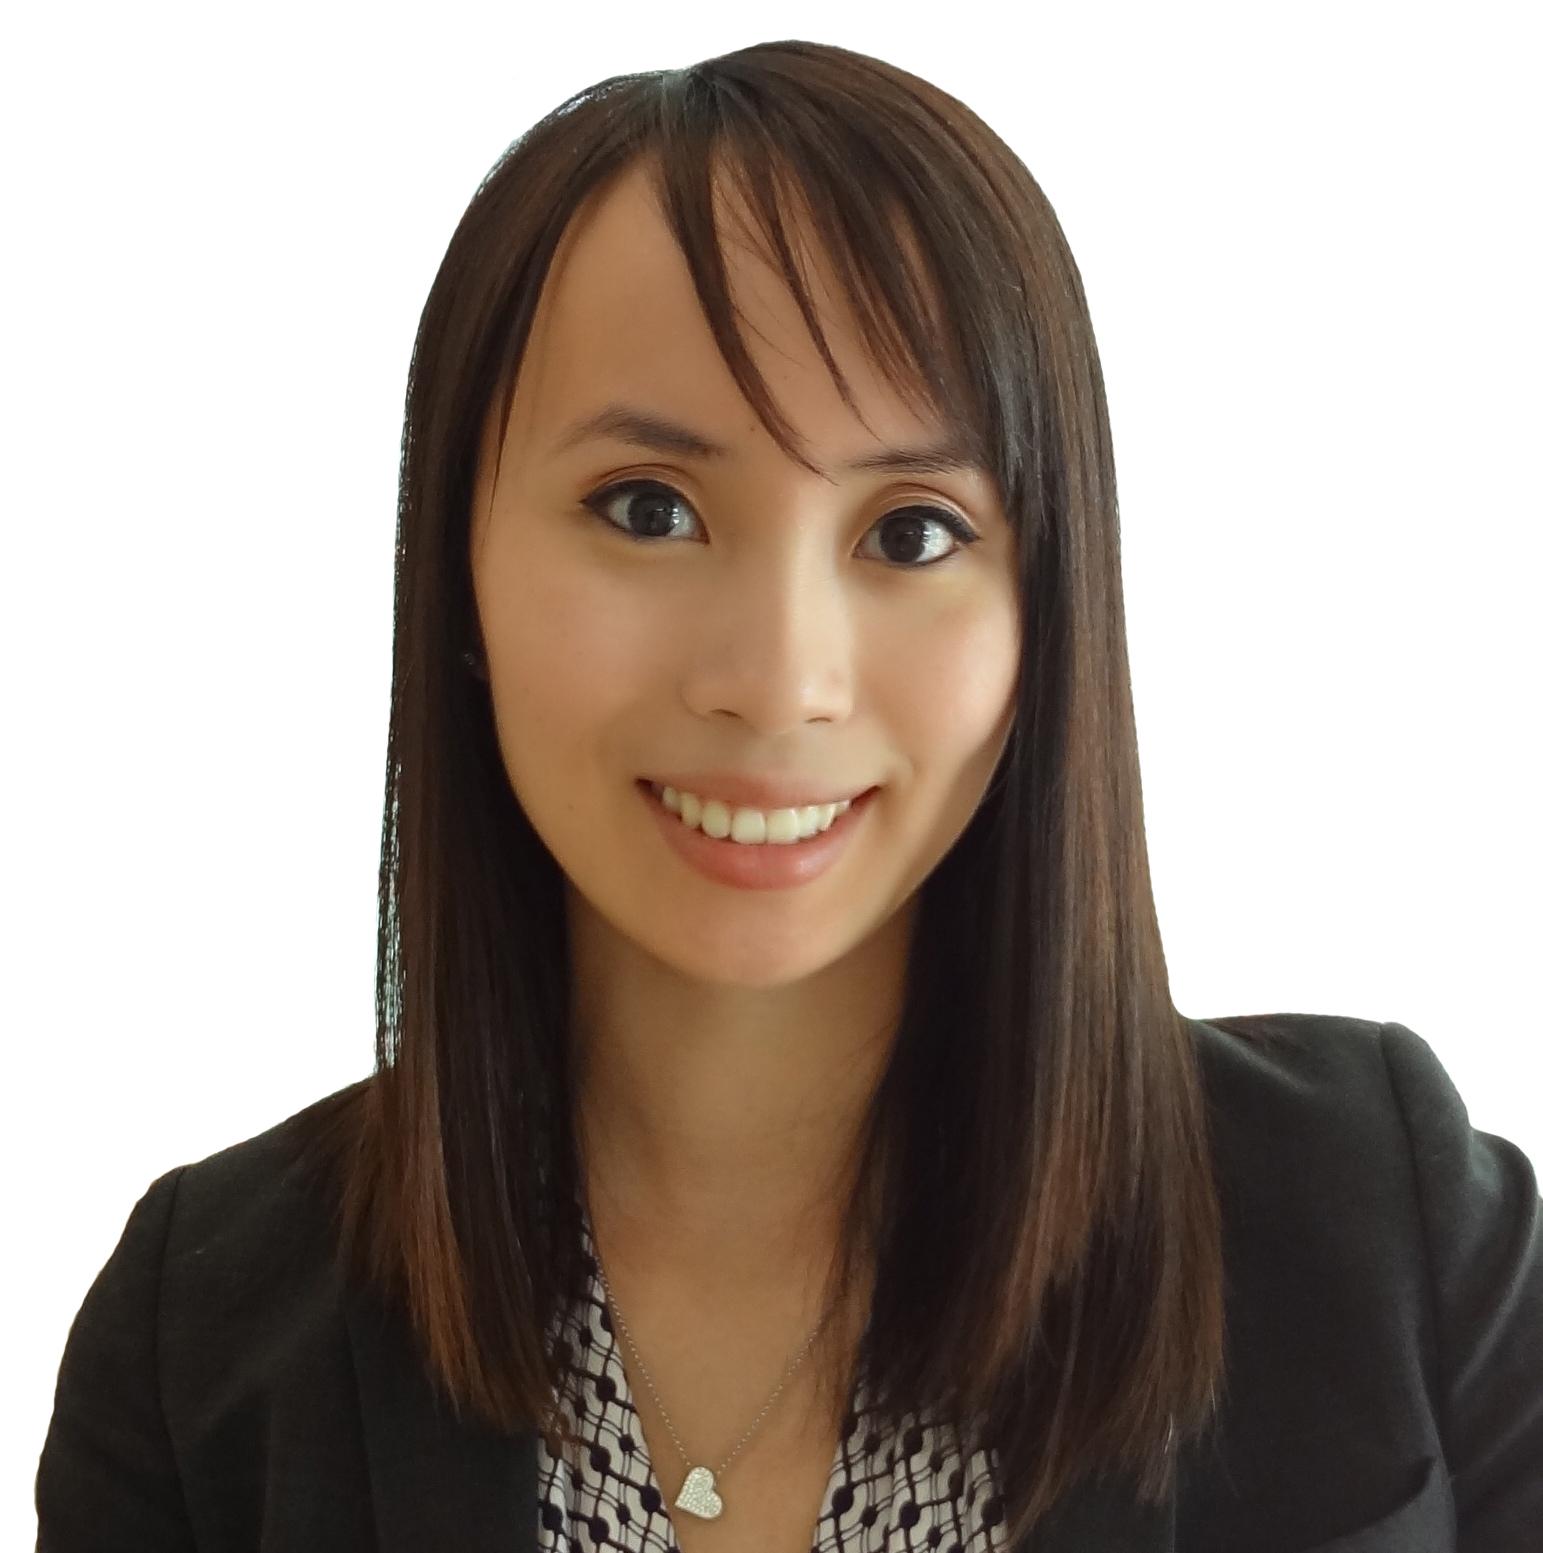 Sarah Chin